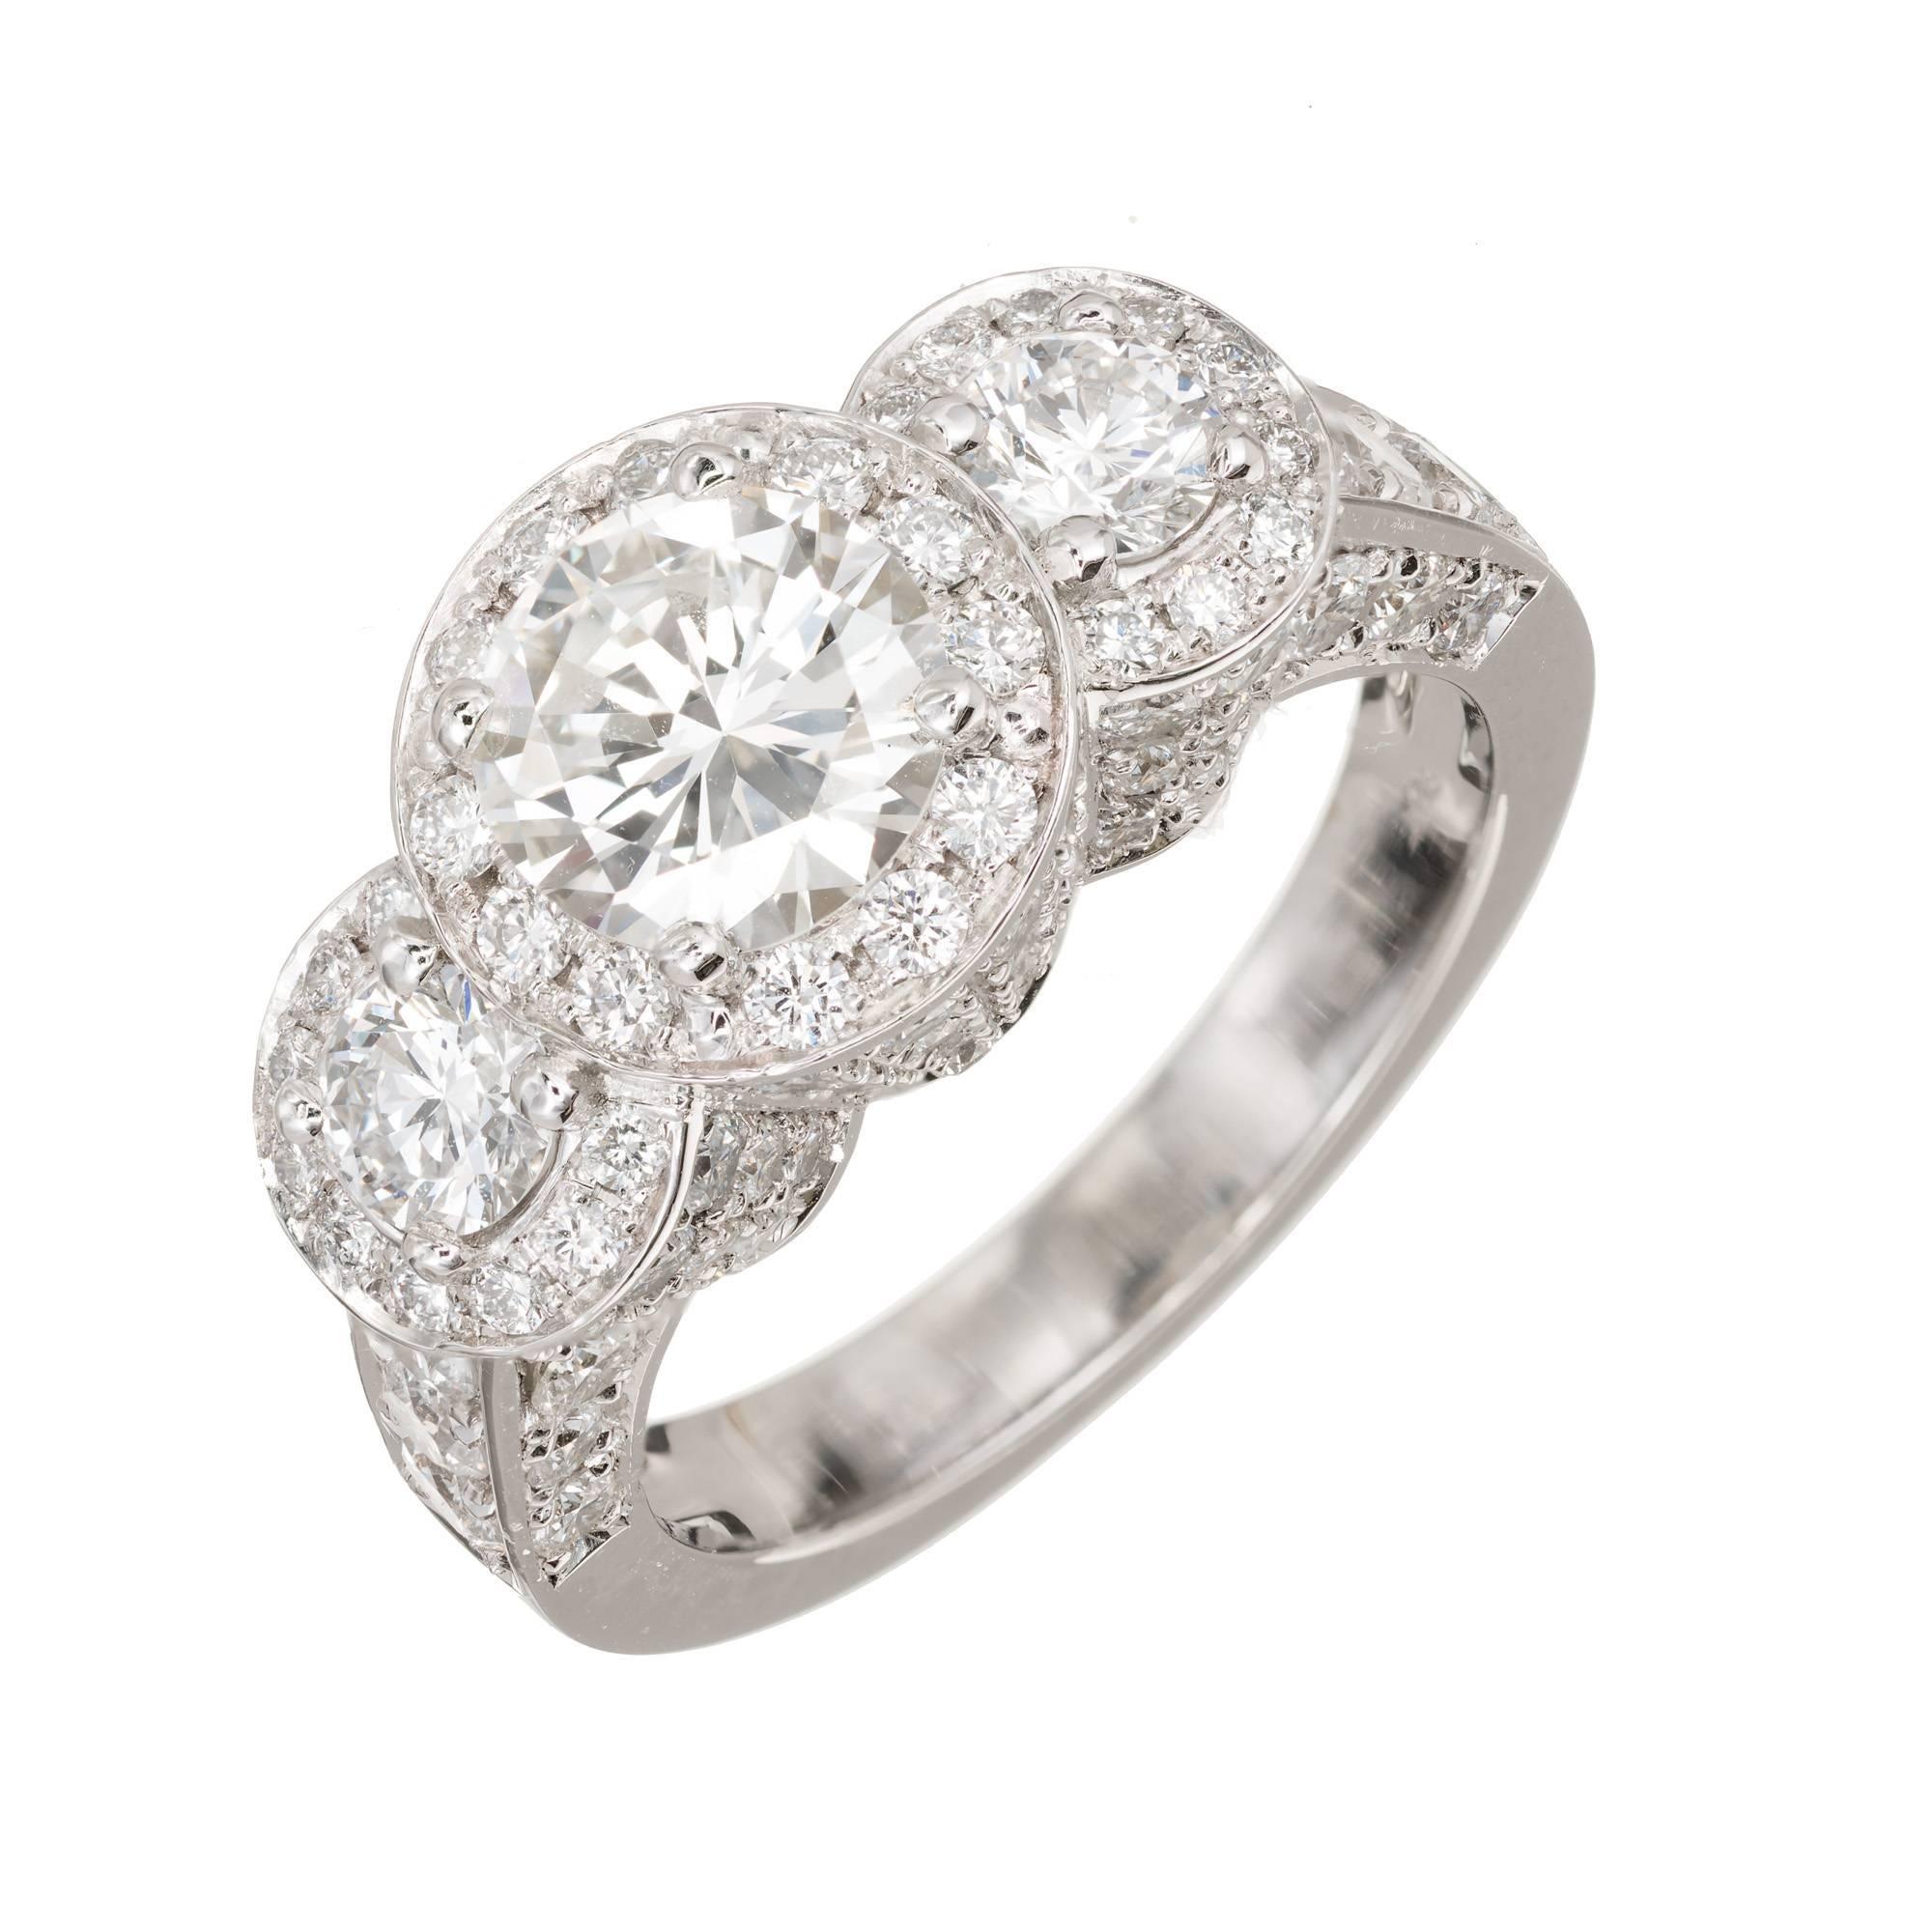 Peter Suchy 1.96 Carat Diamond Halo Three-Stone Platinum Engagement Ring